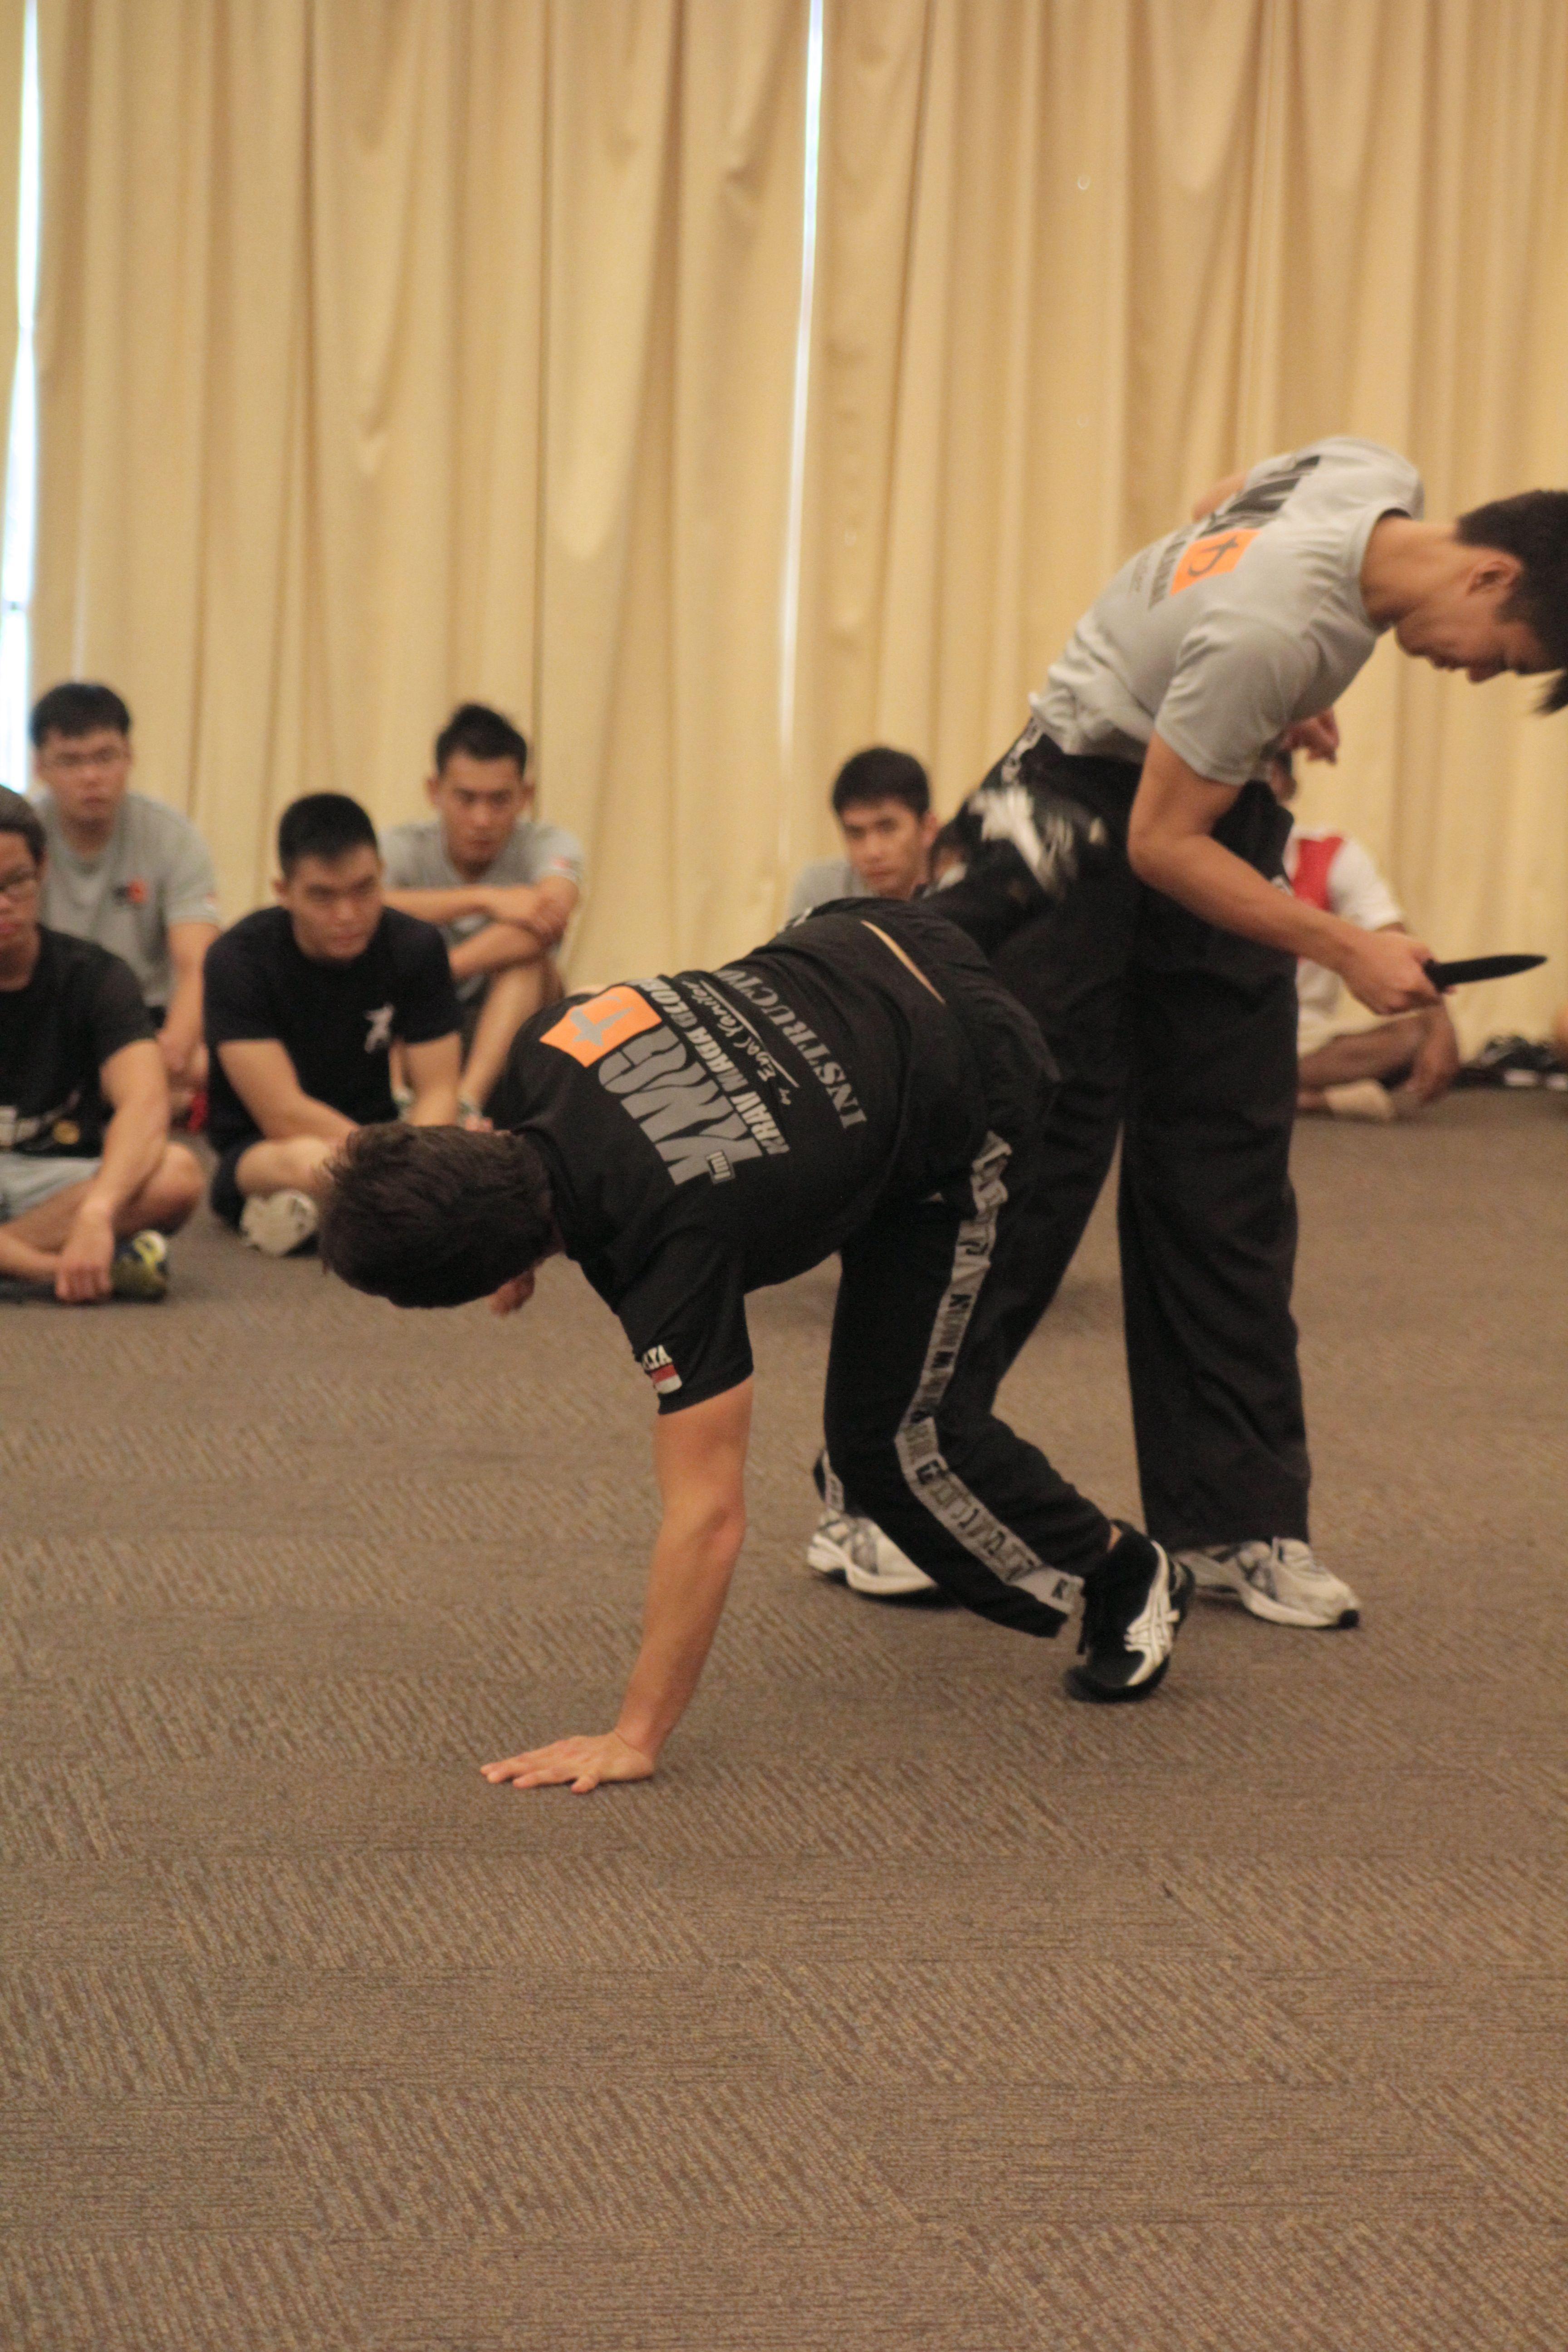 KMG World Tour Singapore 2014 with Ilya Dunsky